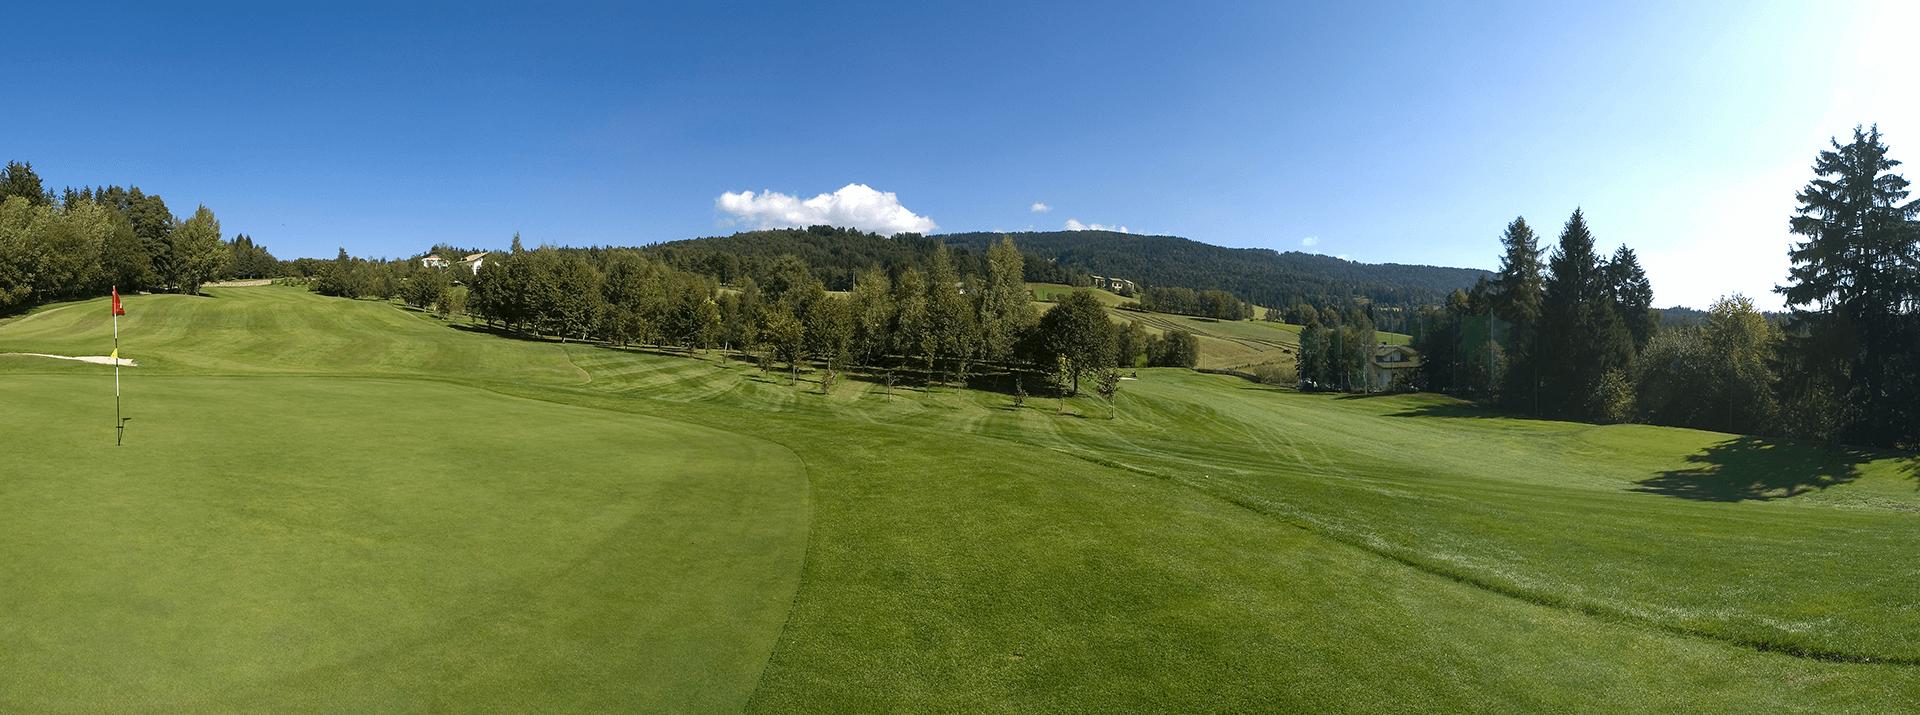 Sport et golf au Tyrol du Sud